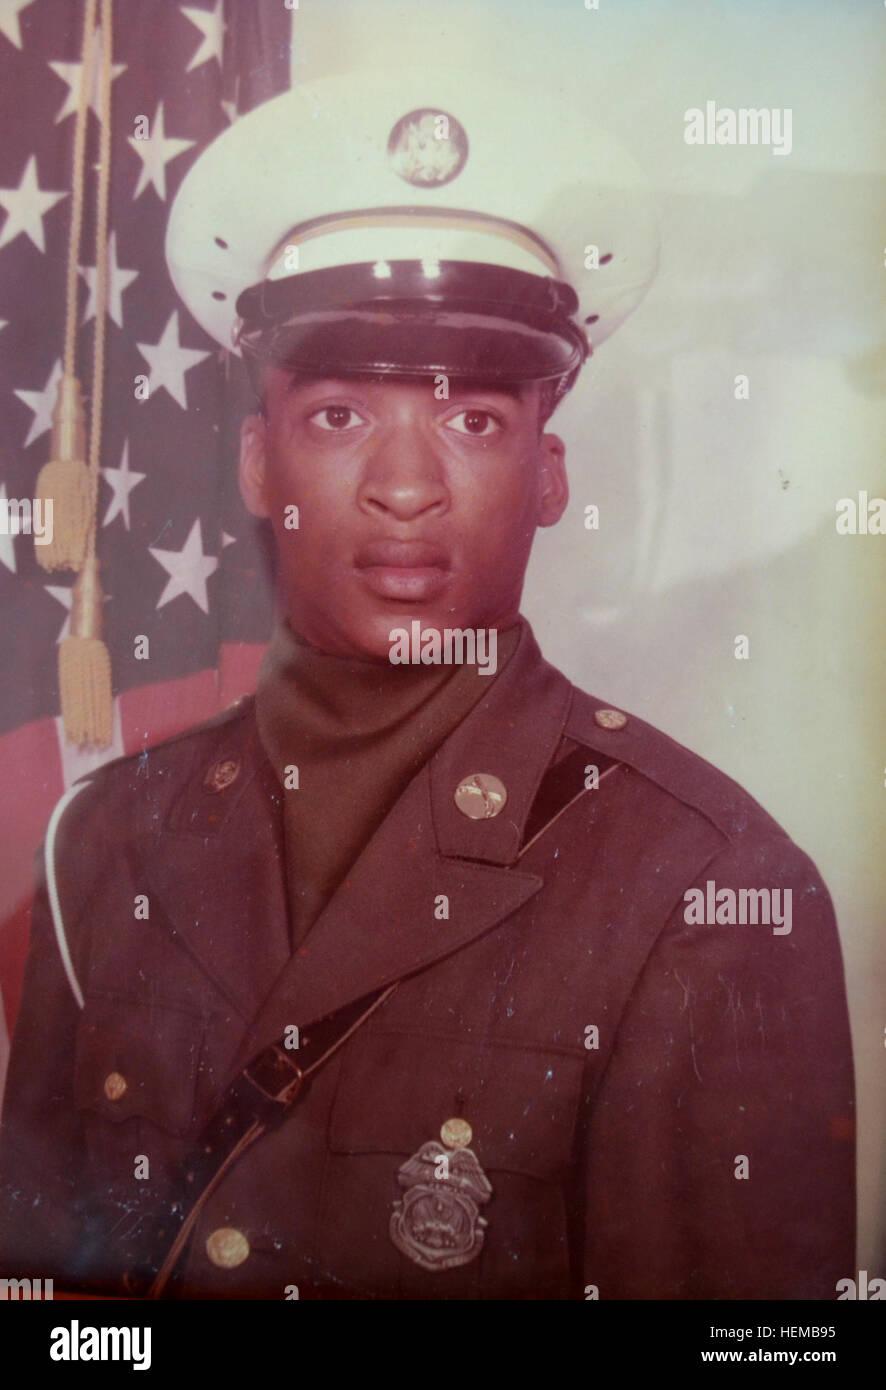 A younger David Ricks as a military policeman stationed at Camp Zama